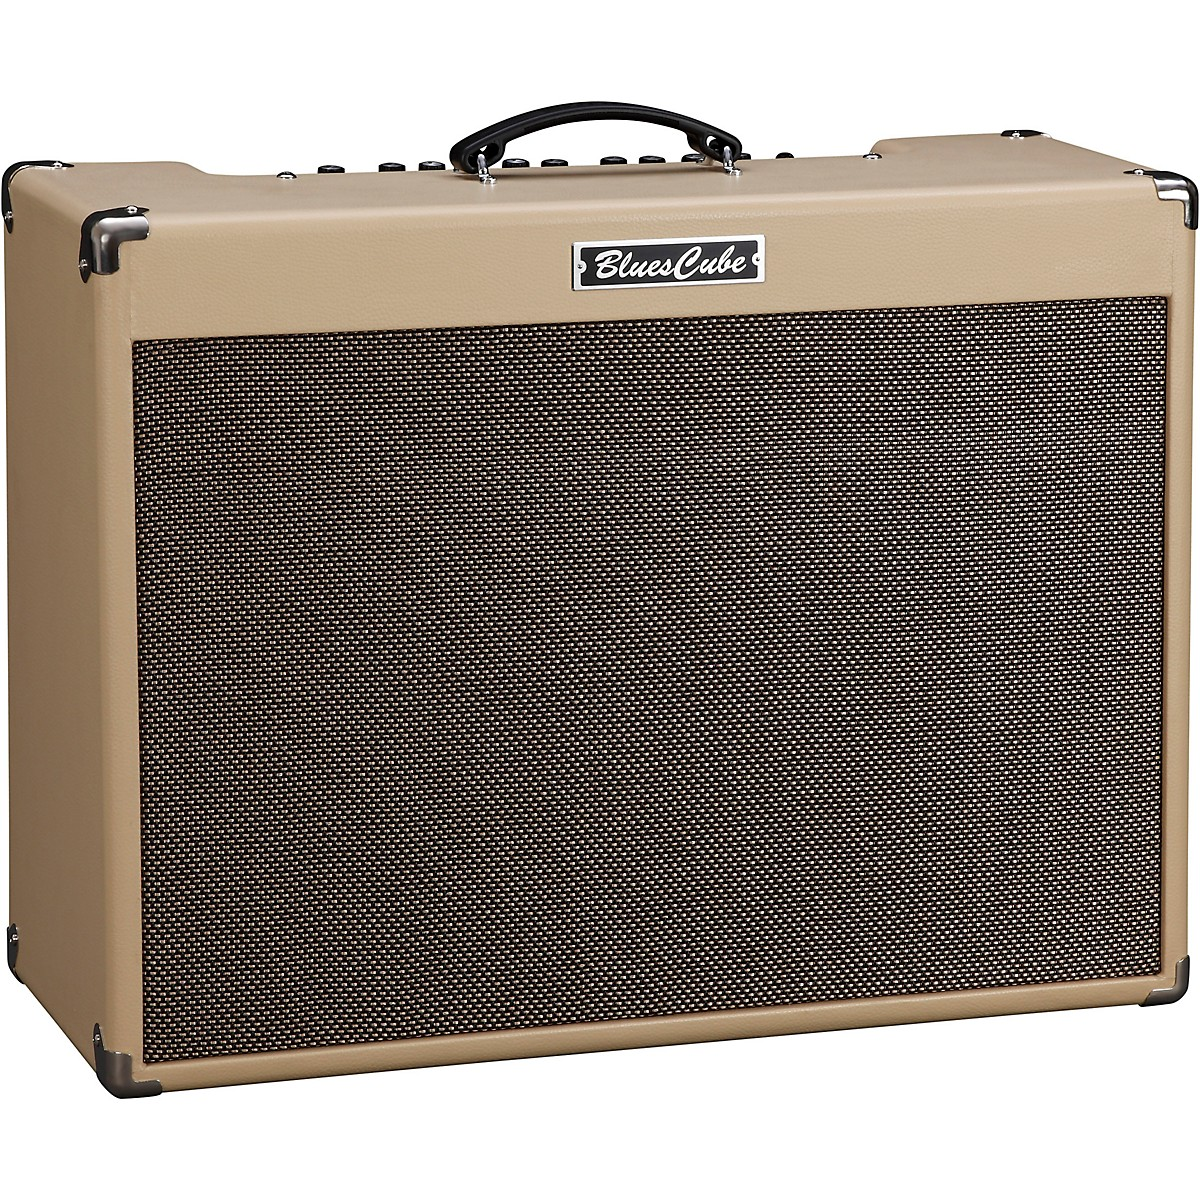 Roland Blues Cube Artist 85W 2x12 Guitar Combo Amp